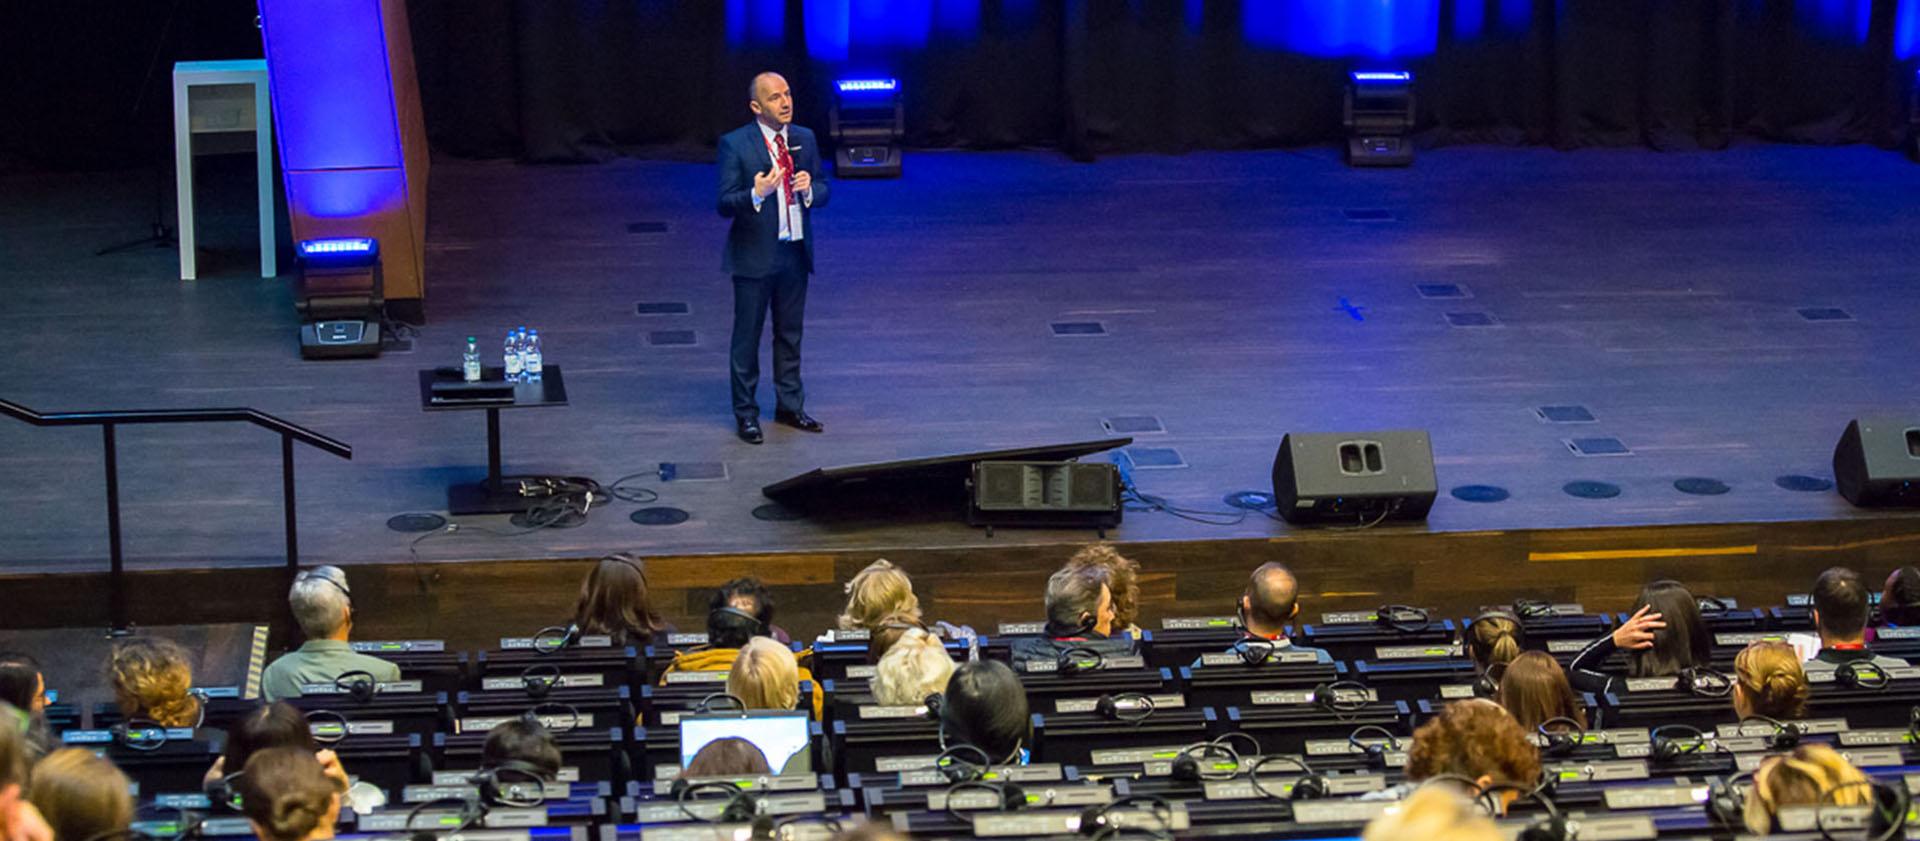 Prezentacje i konferencje